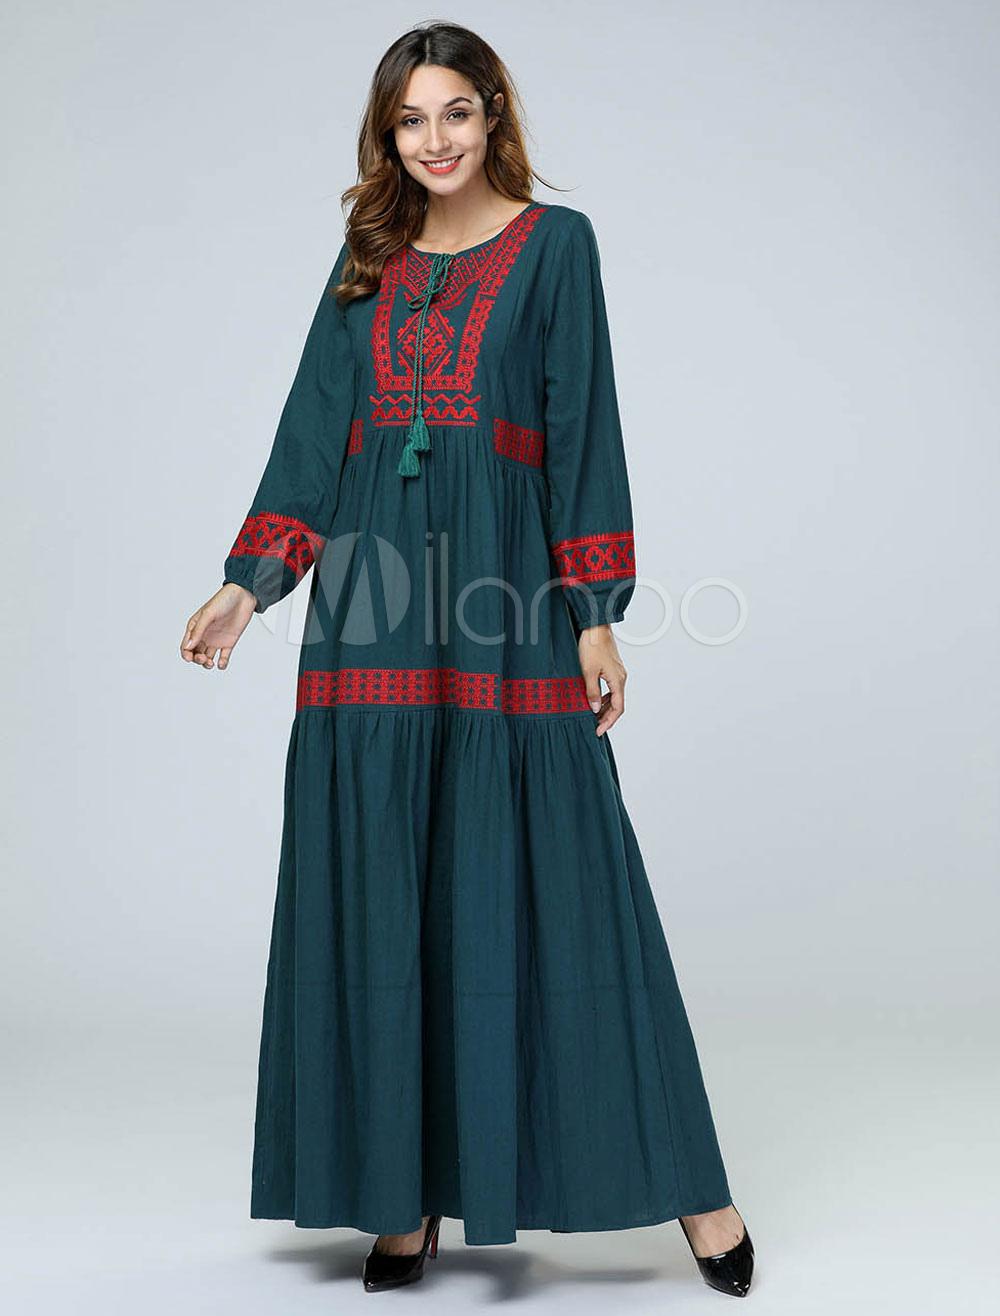 c9837b1537 ... Oversized Abaya Dress Long Sleeve Round Neck Ethnic Embroidered Tassels Maxi  Dress-No.5. 1. 35%OFF. Color Dark Green